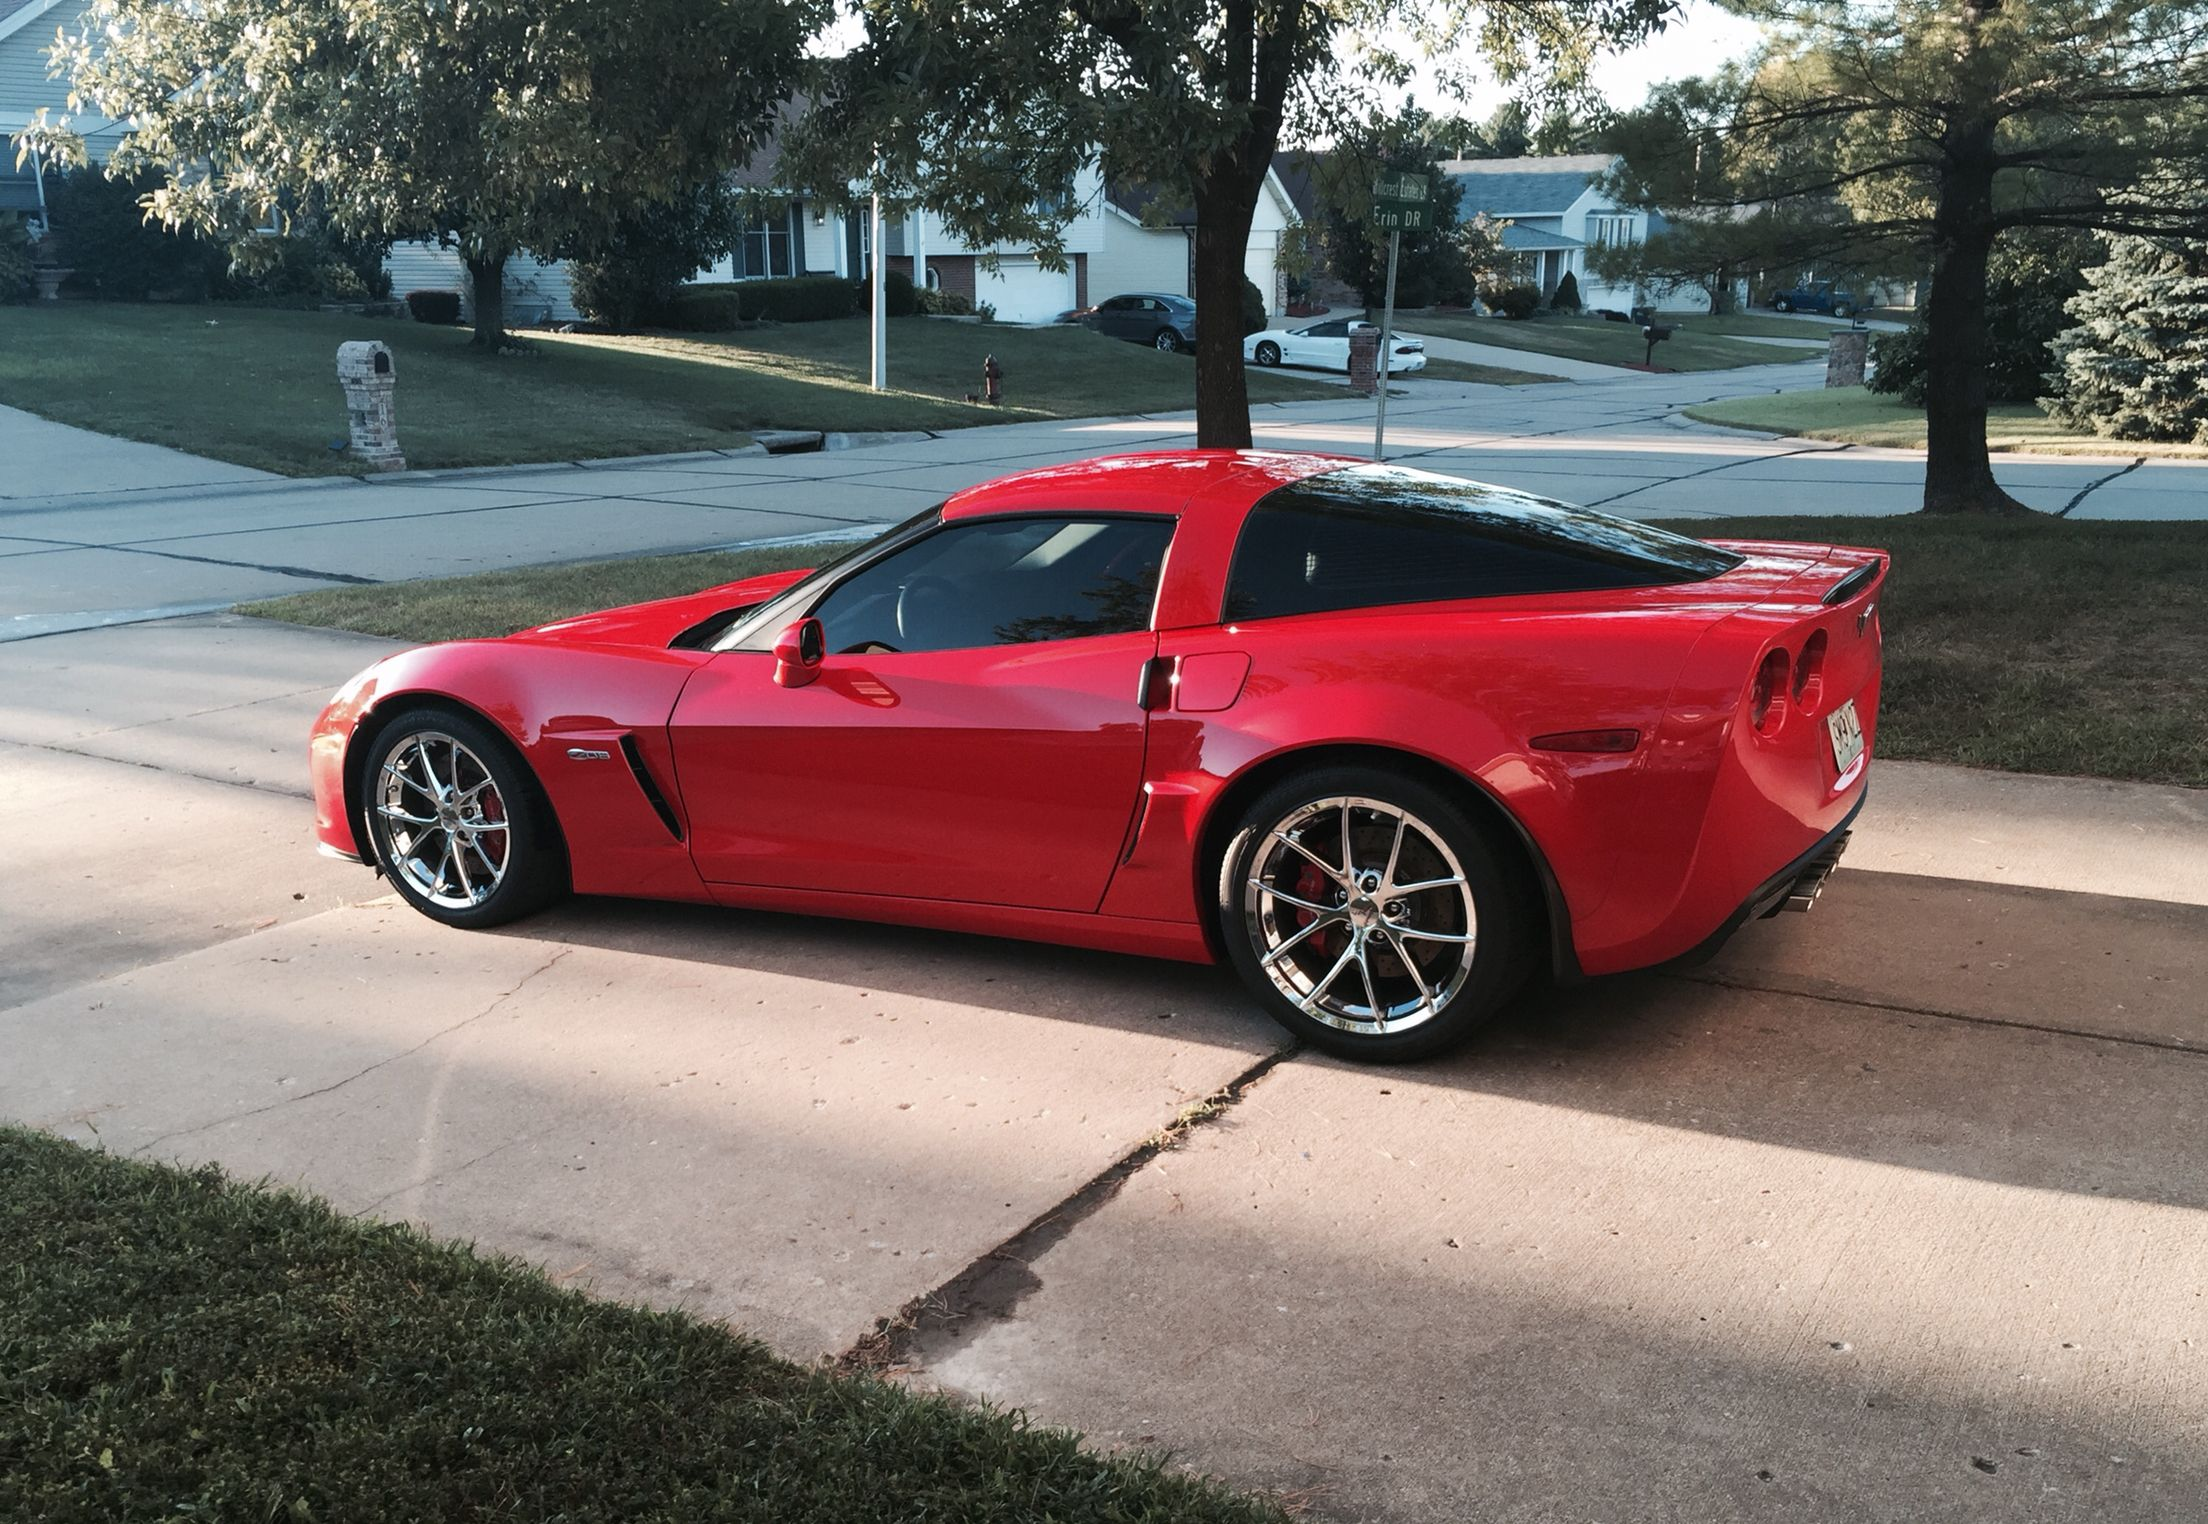 c6 zo6 corvette car stuff pinterest zo6 corvette corvette and car stuff. Black Bedroom Furniture Sets. Home Design Ideas